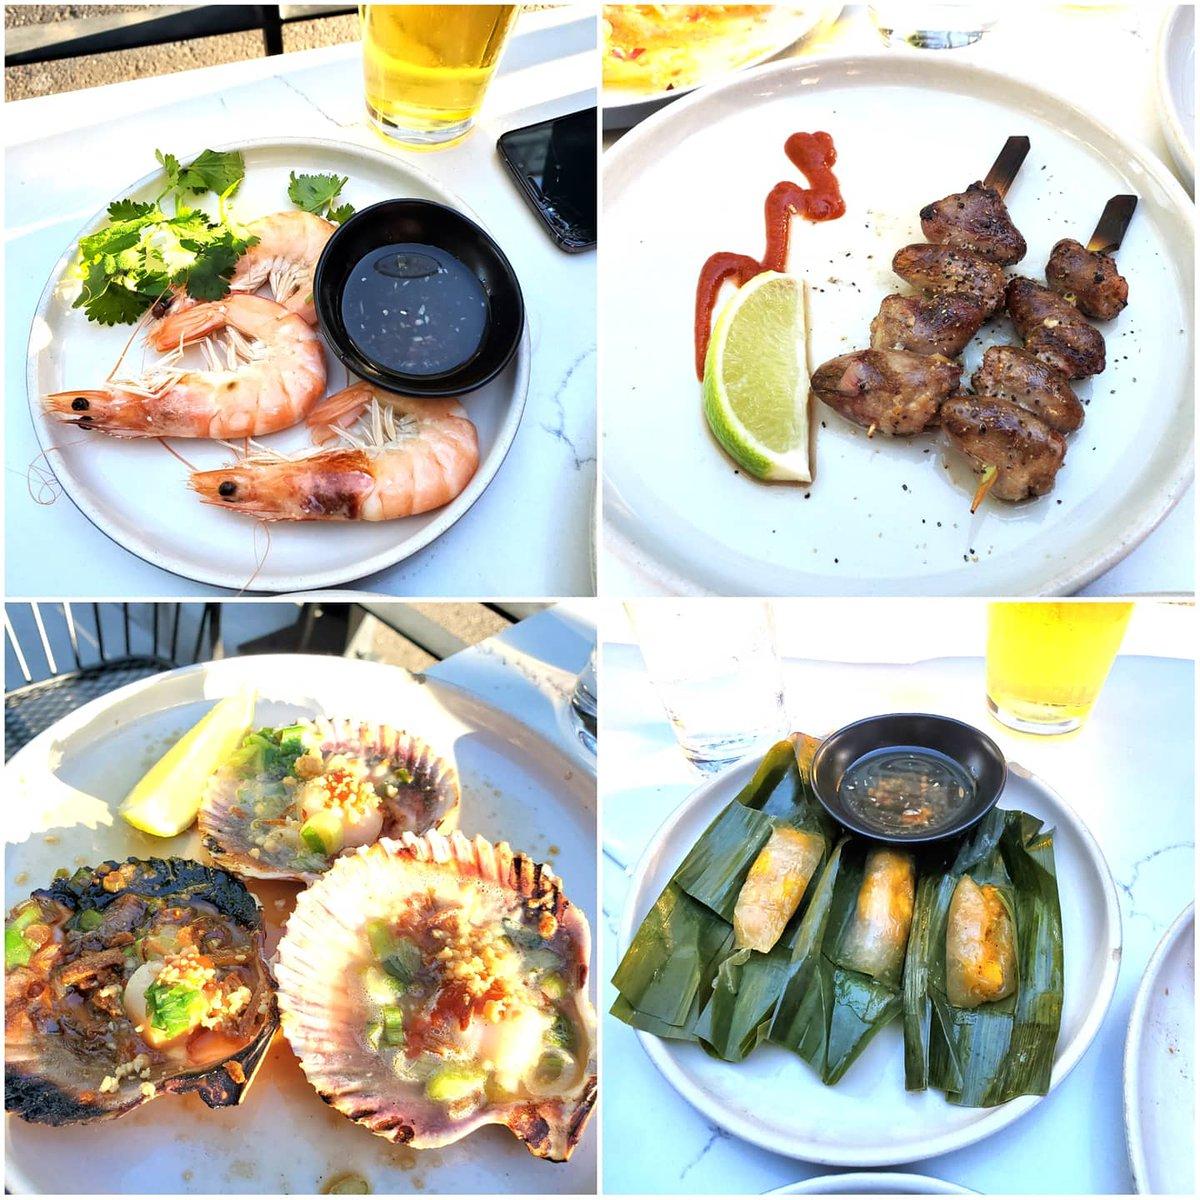 How about some #tapas and local #craftbeer to get over #humpdaywednesday?😋 #foodie #foodlover @SashaEats @SteveKubota @zappafaye @JohanBBT @Tastebudbrett @beerhunter74 @DivaFoodies @Boozy_Foodie @BoozyEpicure @knoxgourmet @jay_eatz @sl2016_sl @hoochhhhh @pietrosd @jflorez @cazij https://t.co/eeSsQwTxNI